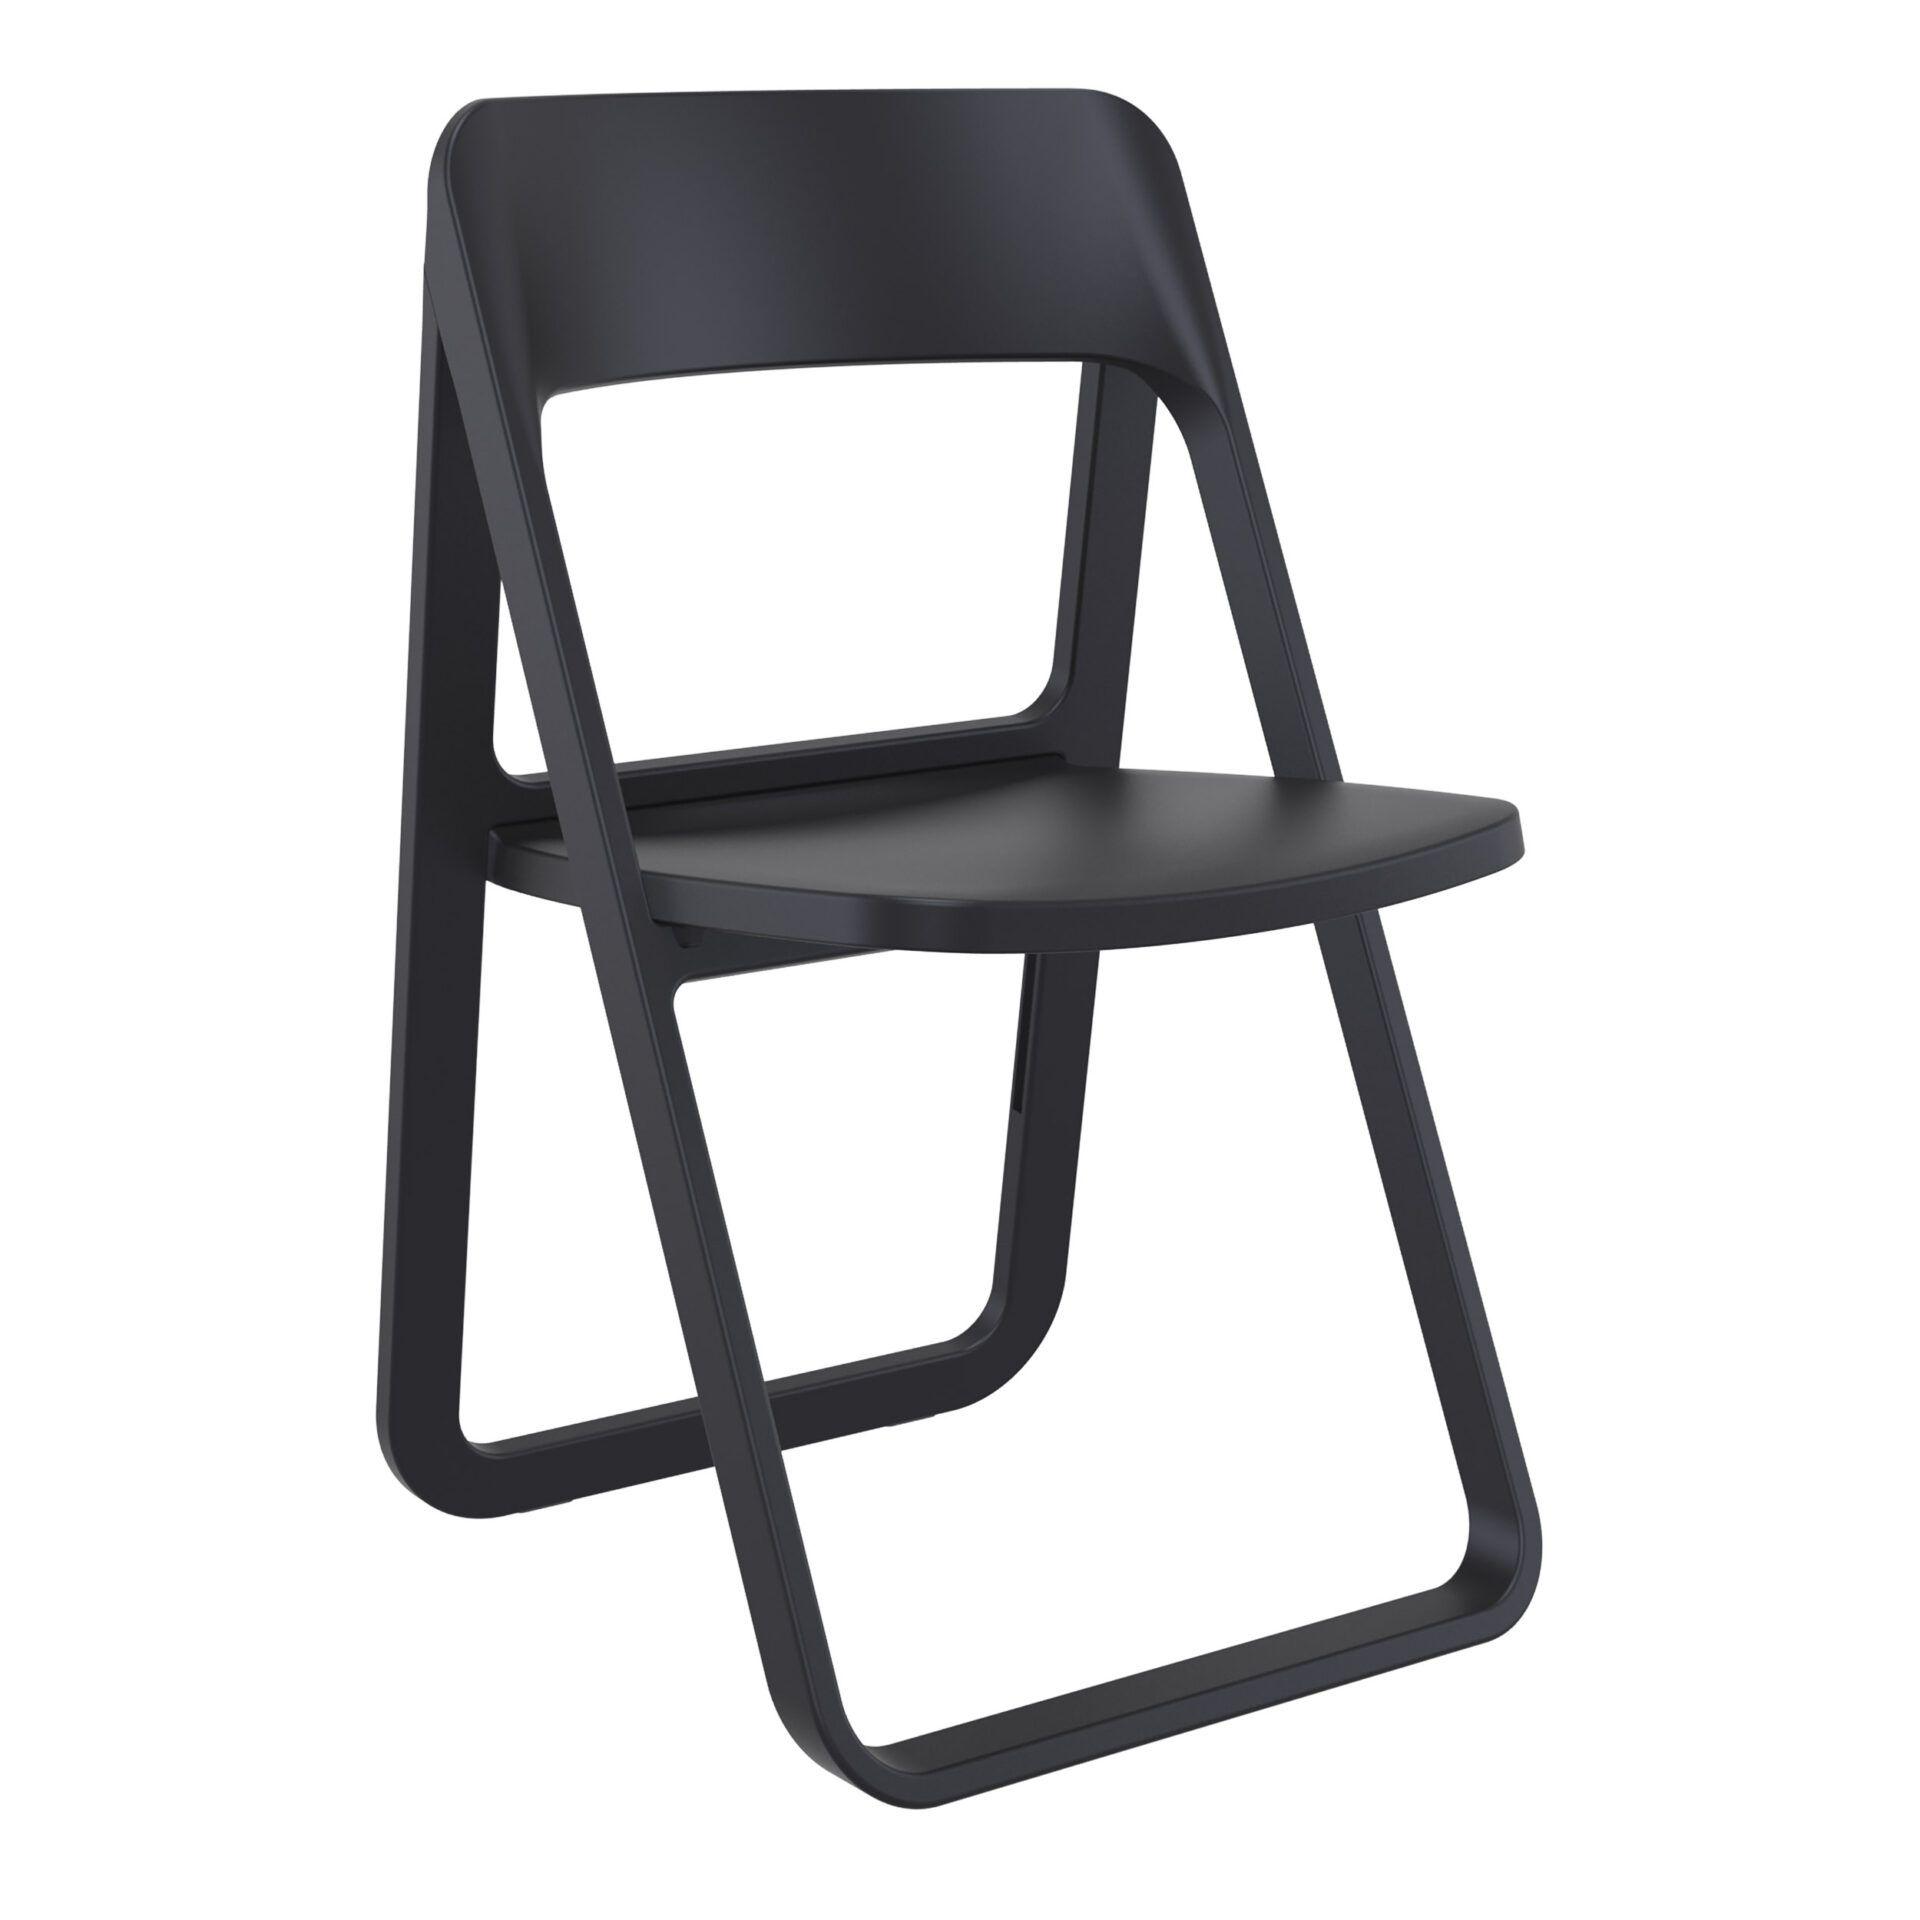 polypropylene dream folding chair black front side